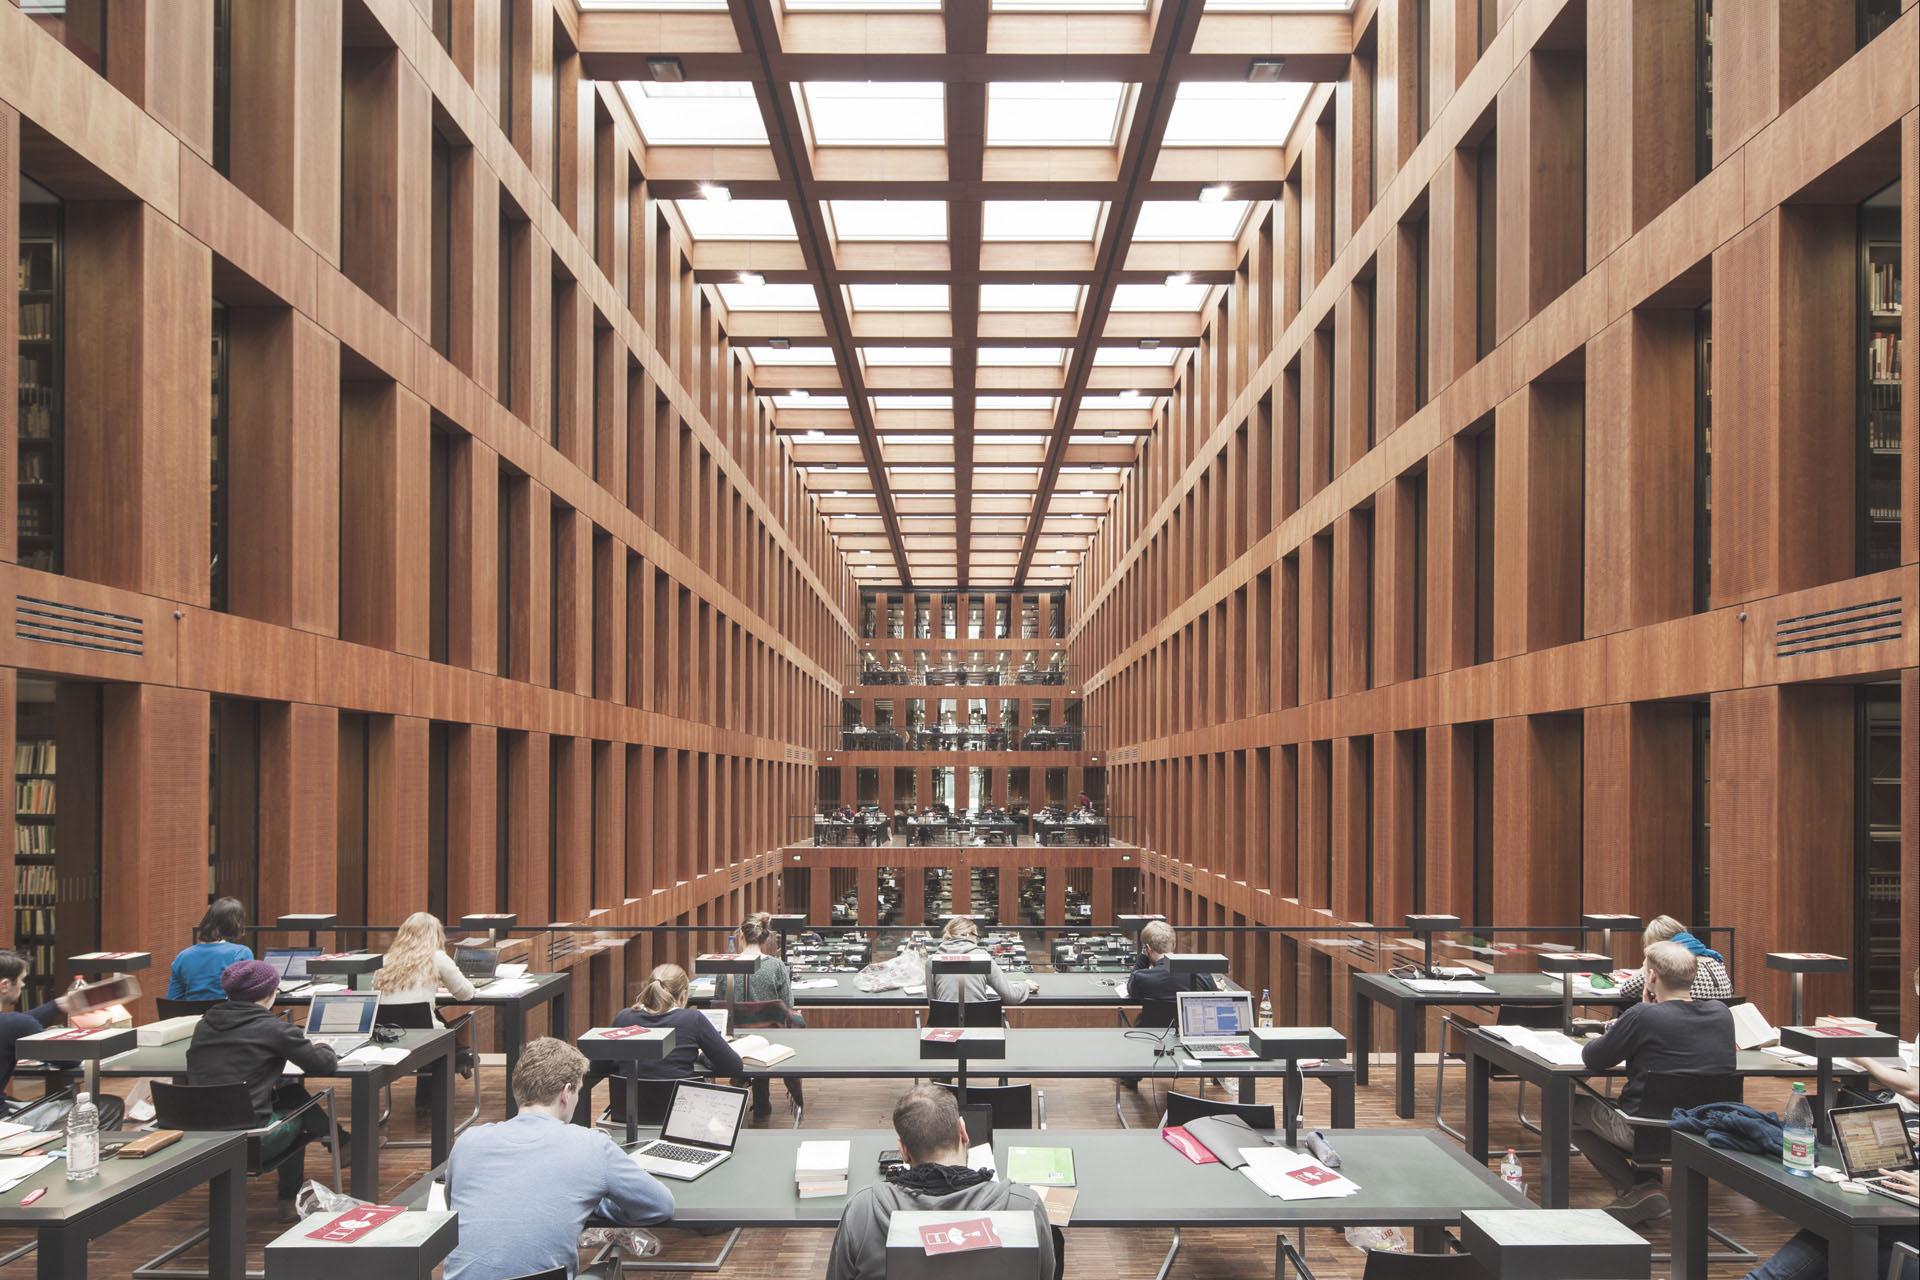 MG 0022x - Grimm Bibliothek Berlin